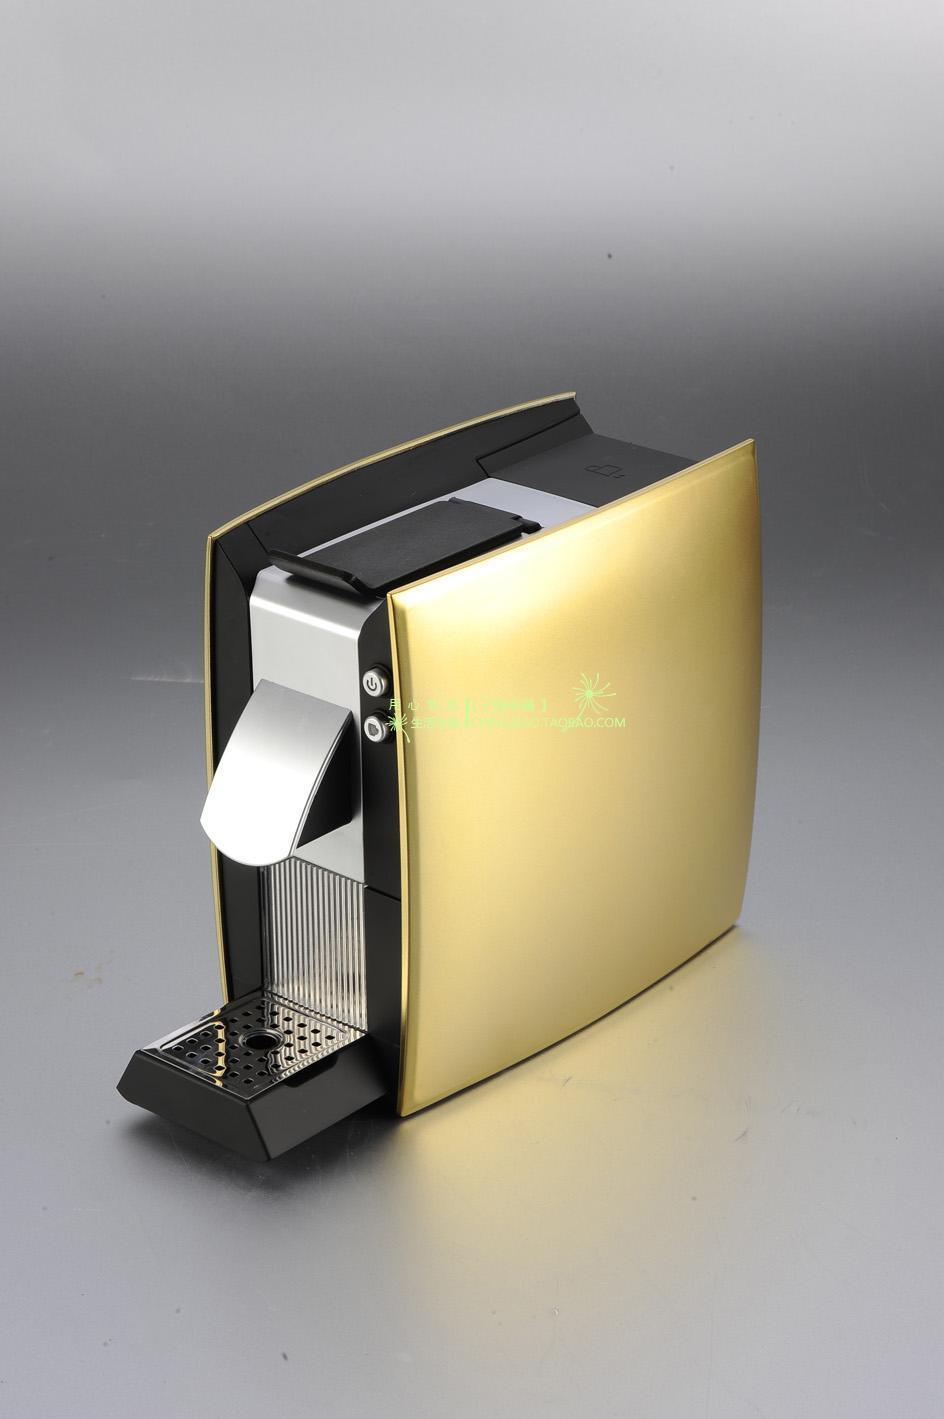 Precision Zinc Die Casting for Handle of Capsule Coffee Machine